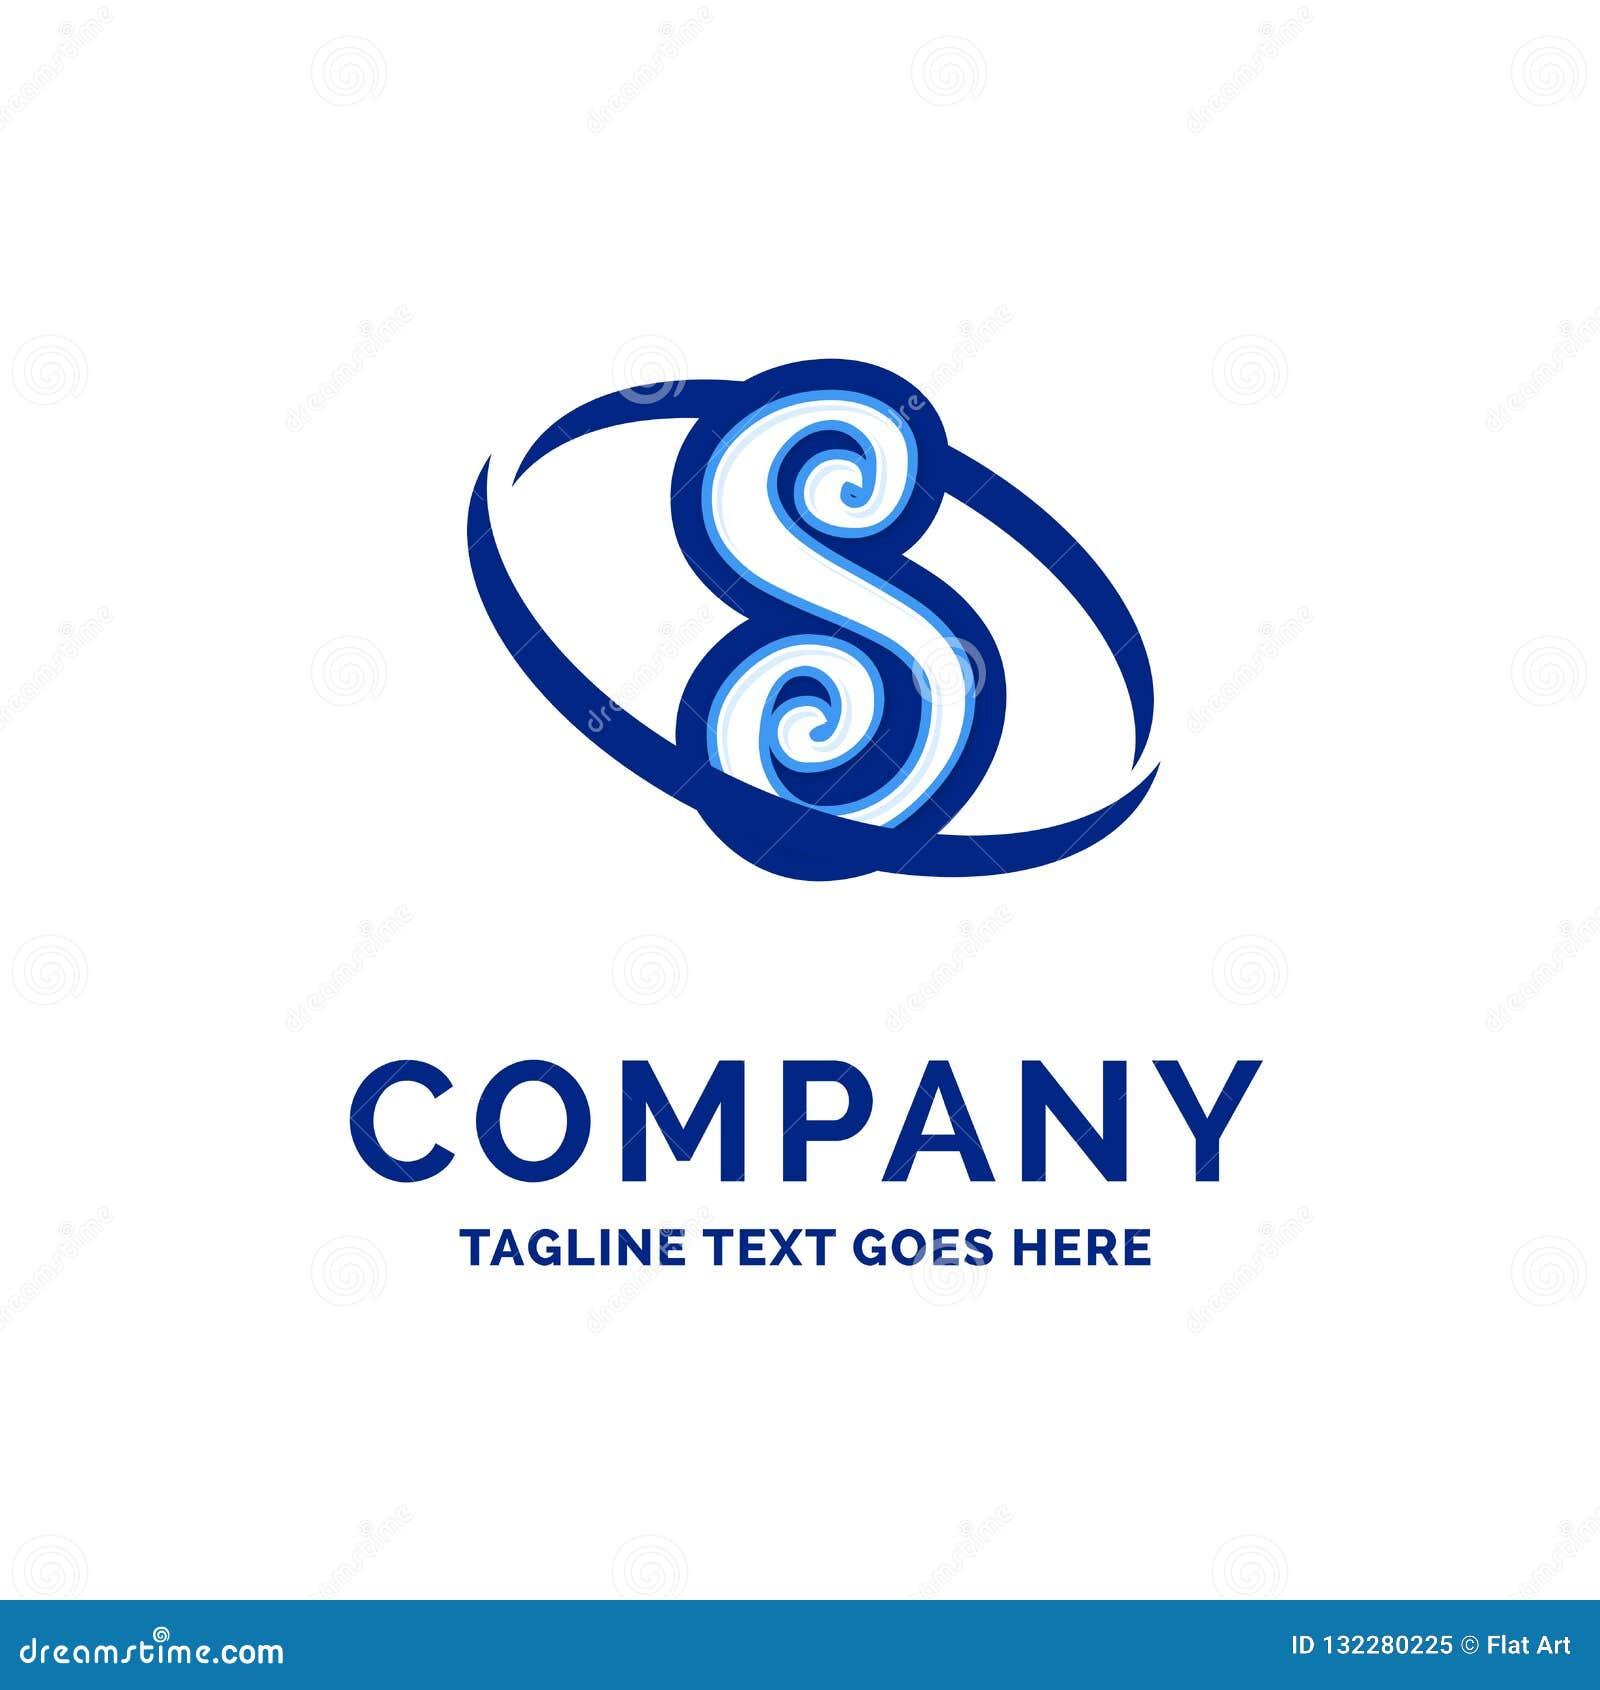 S Company公司名称设计蓝色商标设计